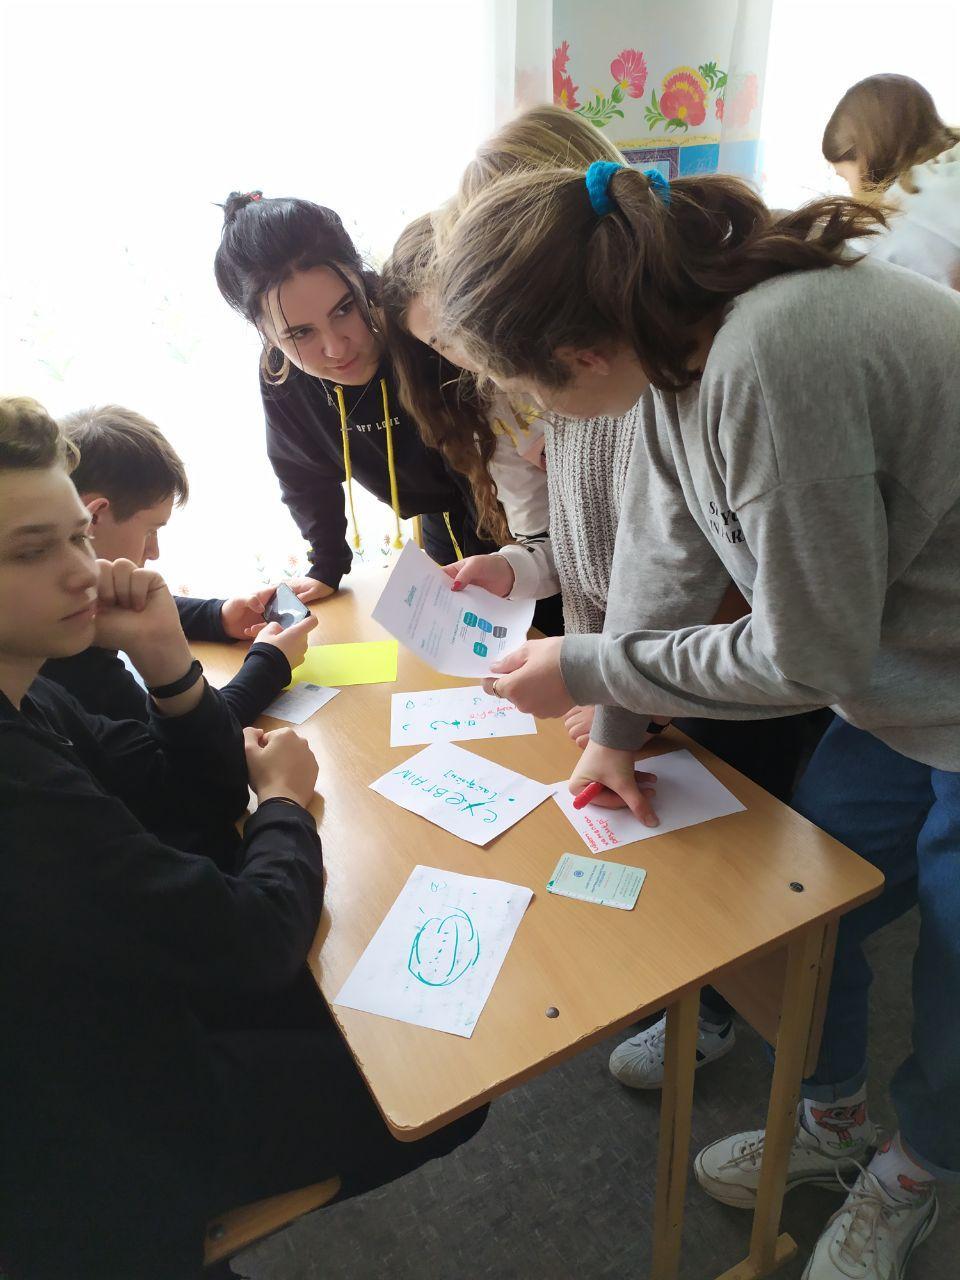 photo_2020-02-05_16-30-51 Kharkiv IT Cluster расширяет границы вместе с Kids2IT!